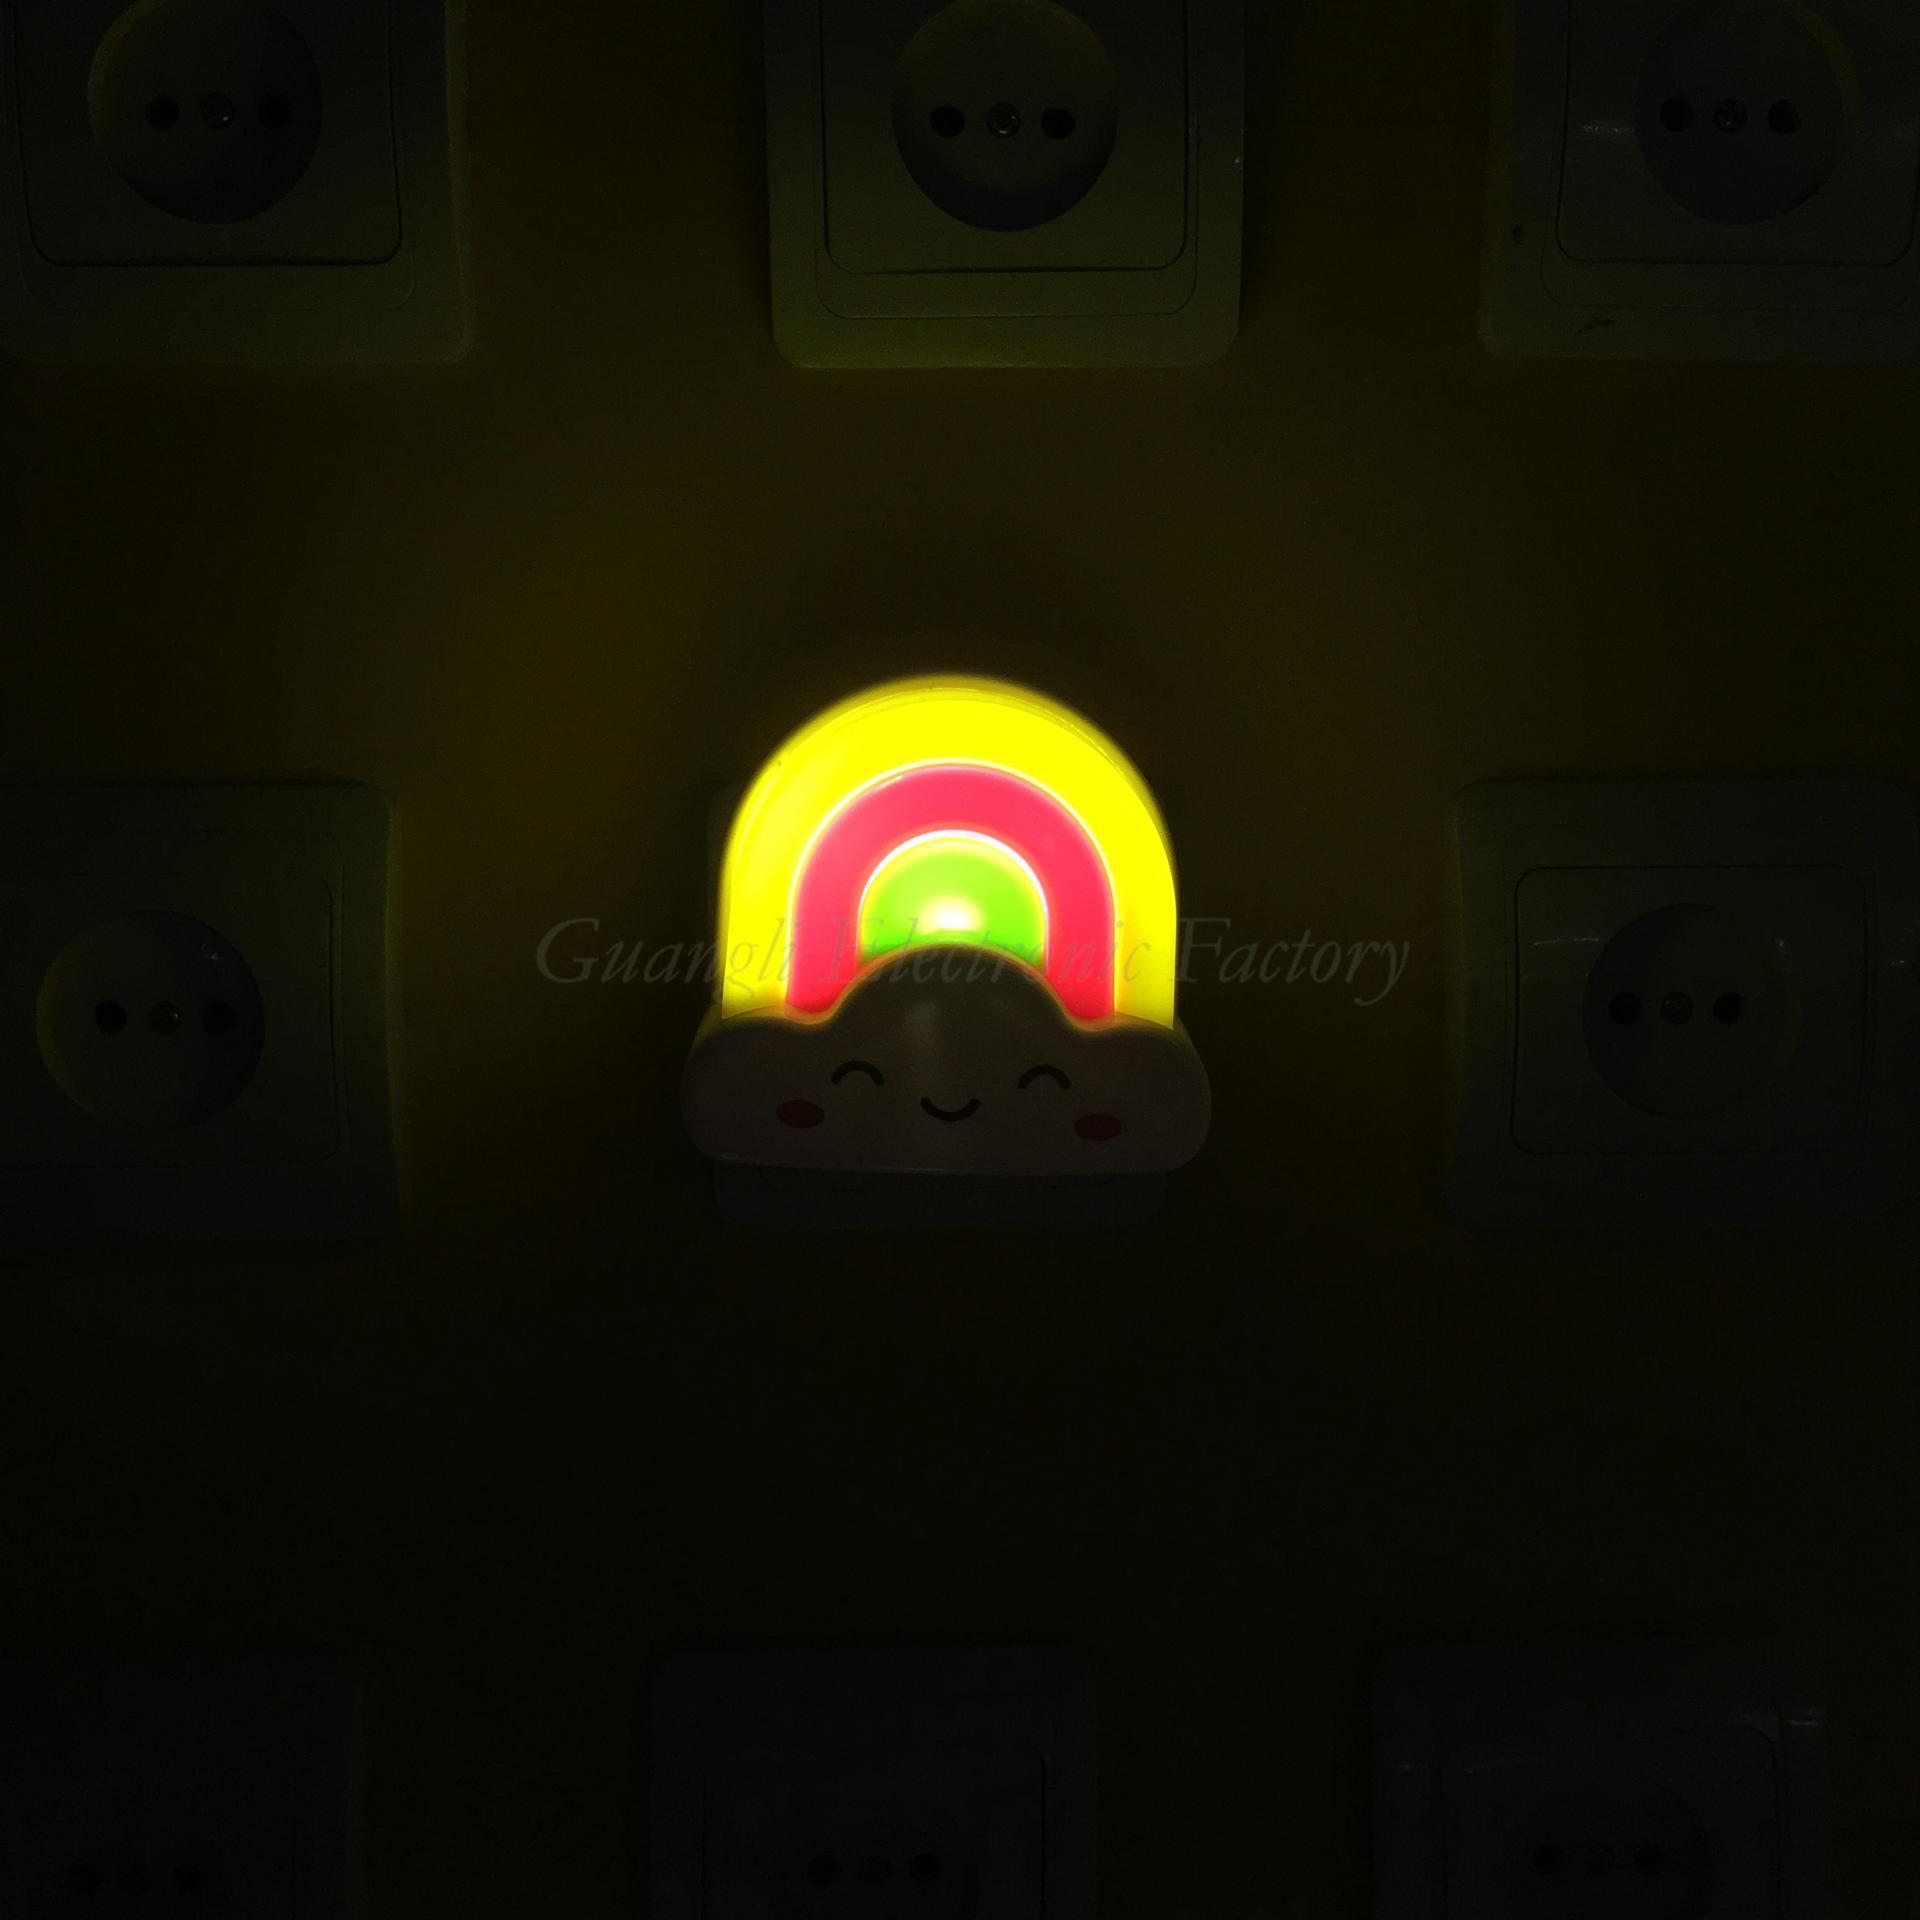 W030 rainbow shape LED SMD mini switch plug in night light and 110V or 220V AC